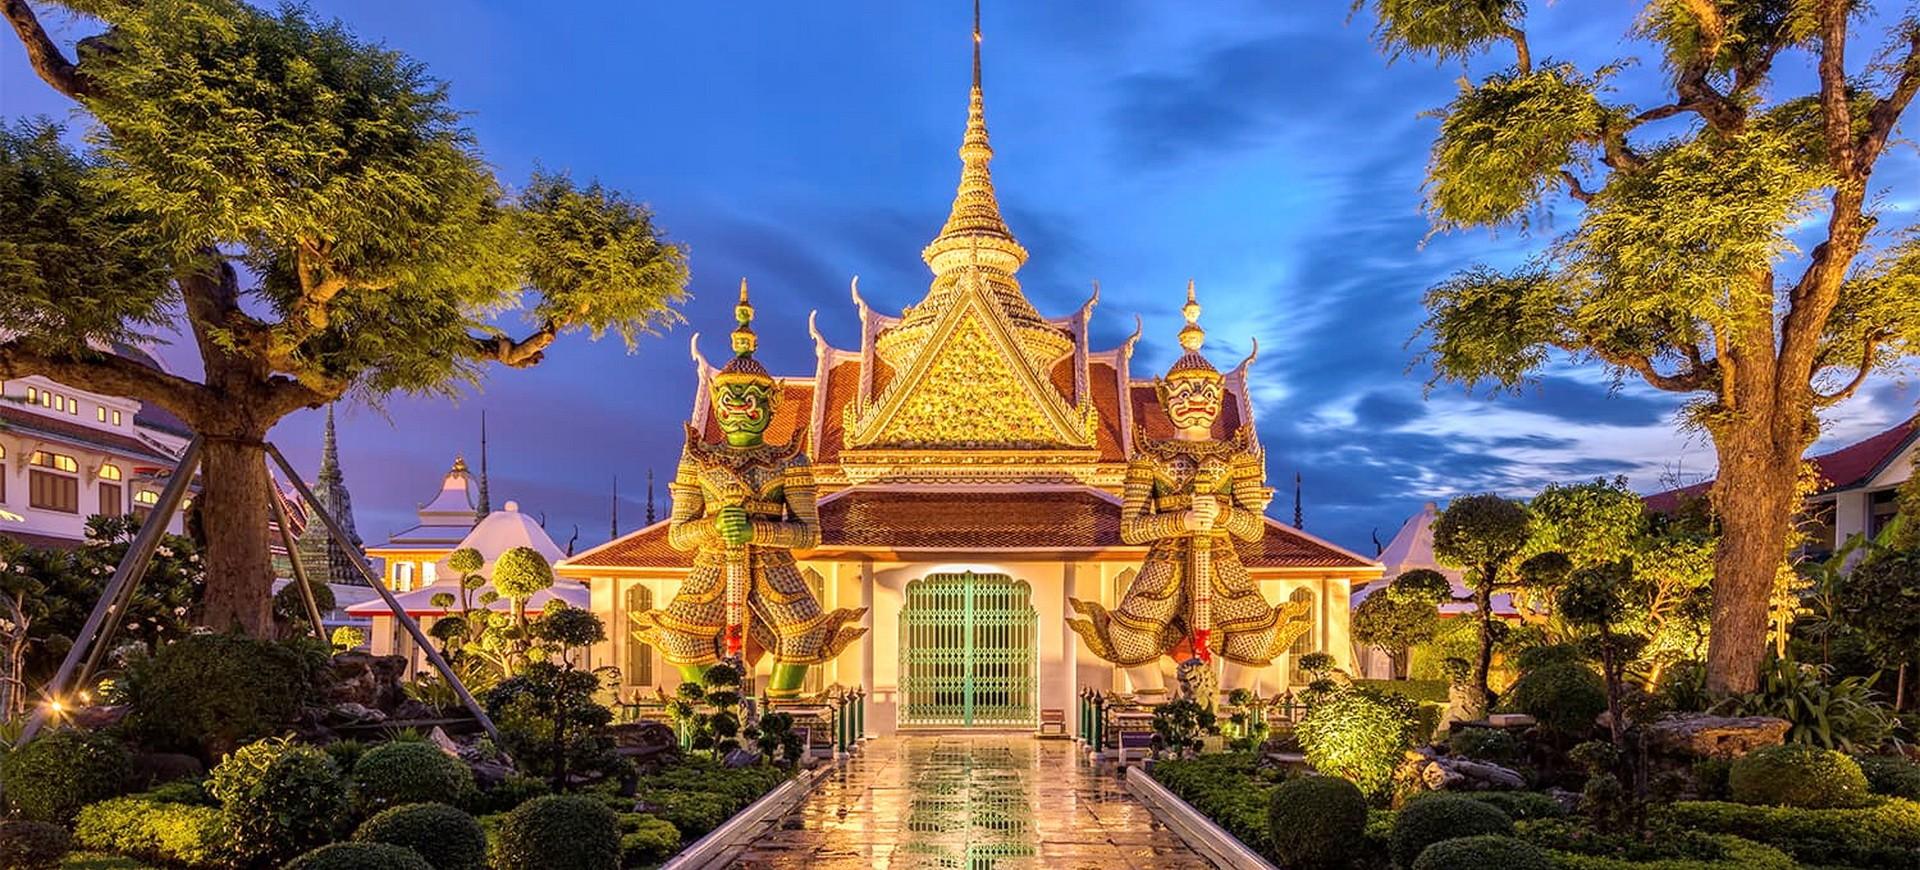 Wat Arun Temple à Bangkok en Thailande